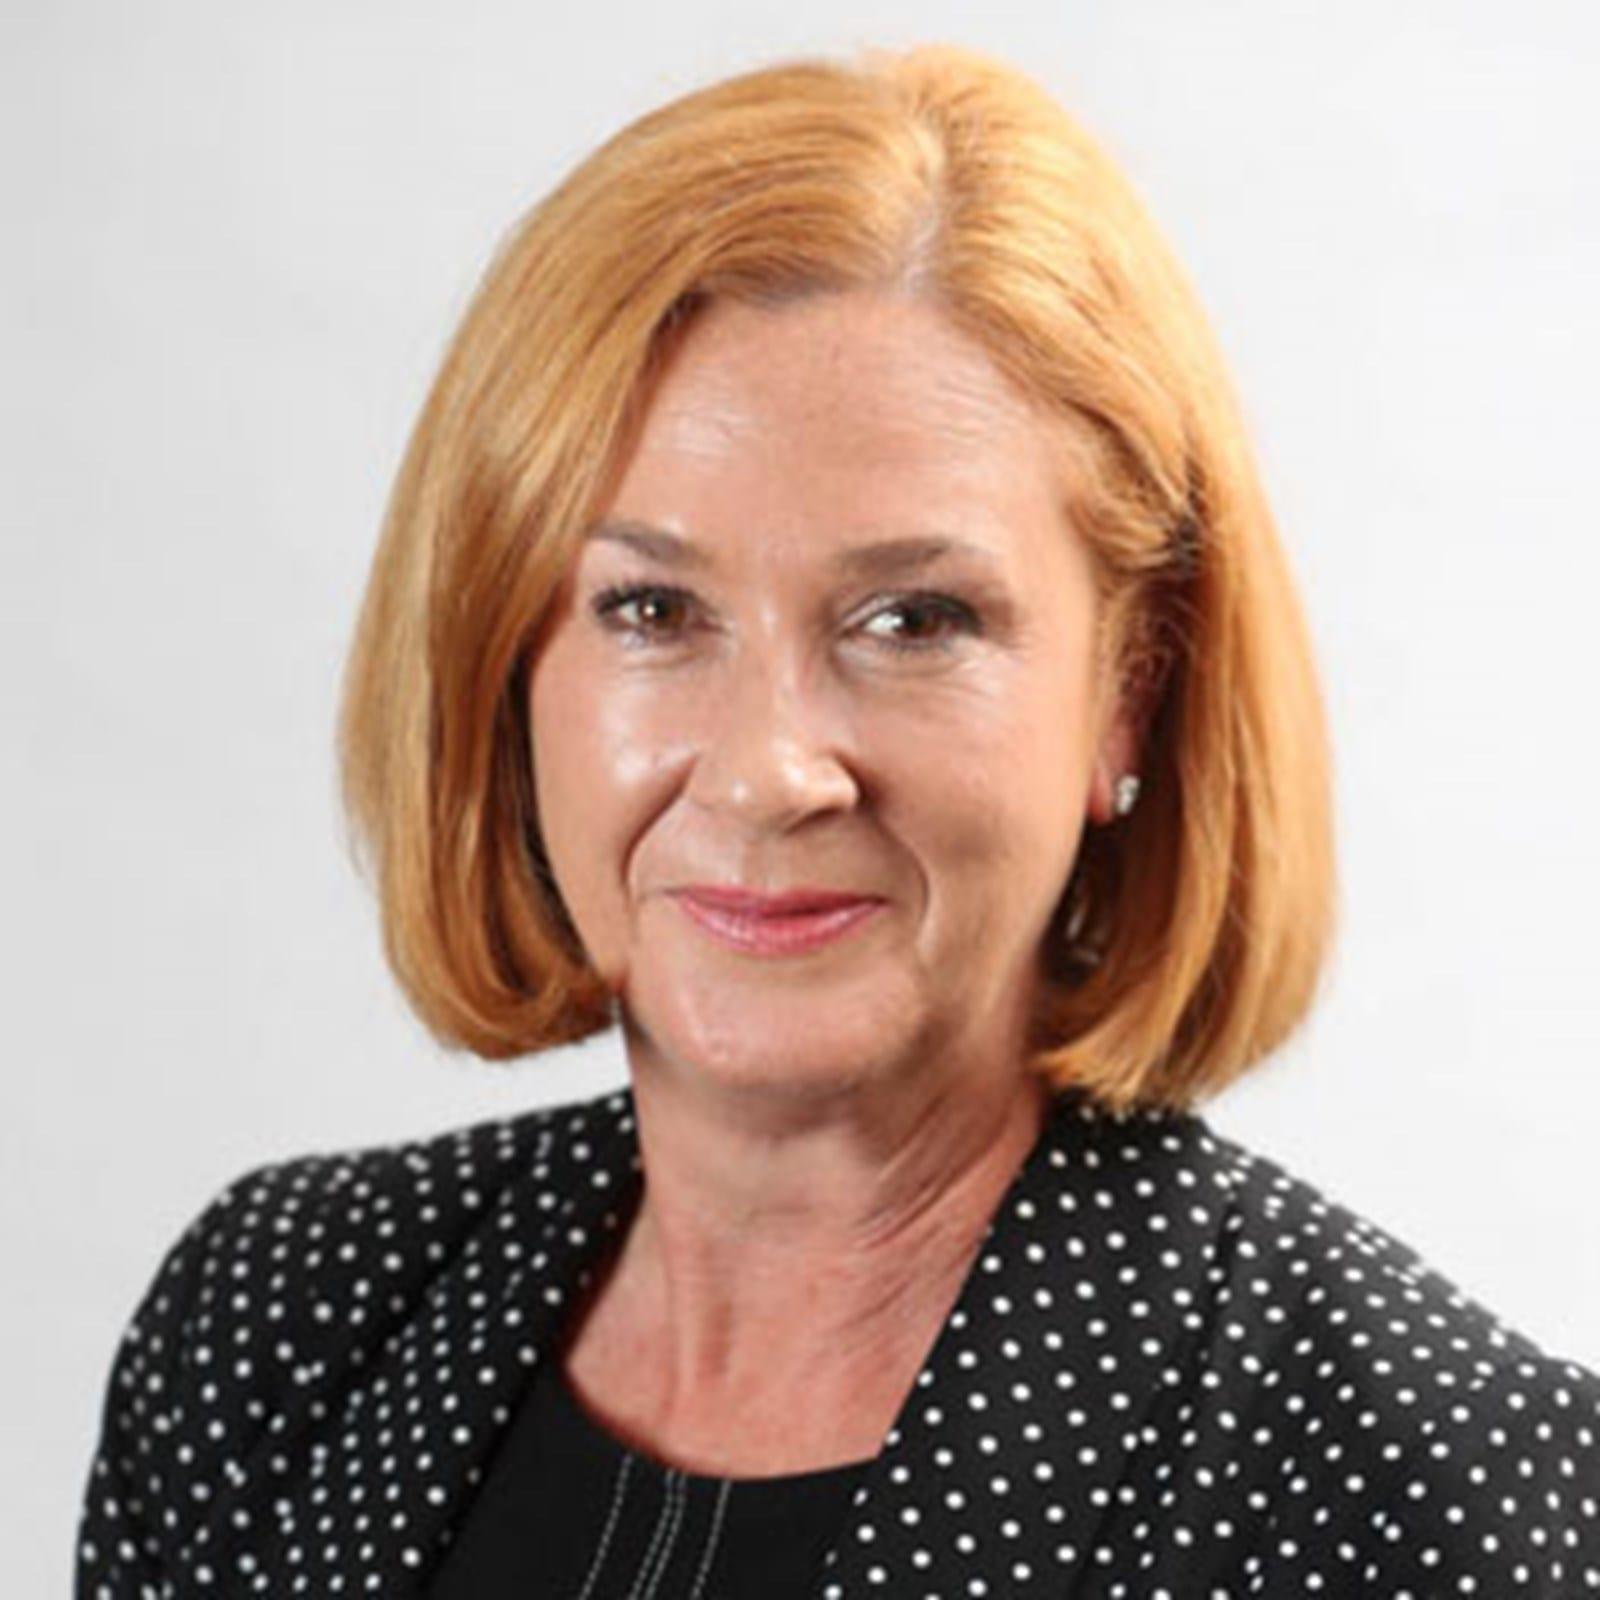 Lynn Sheehy in polka dot jacket smiling